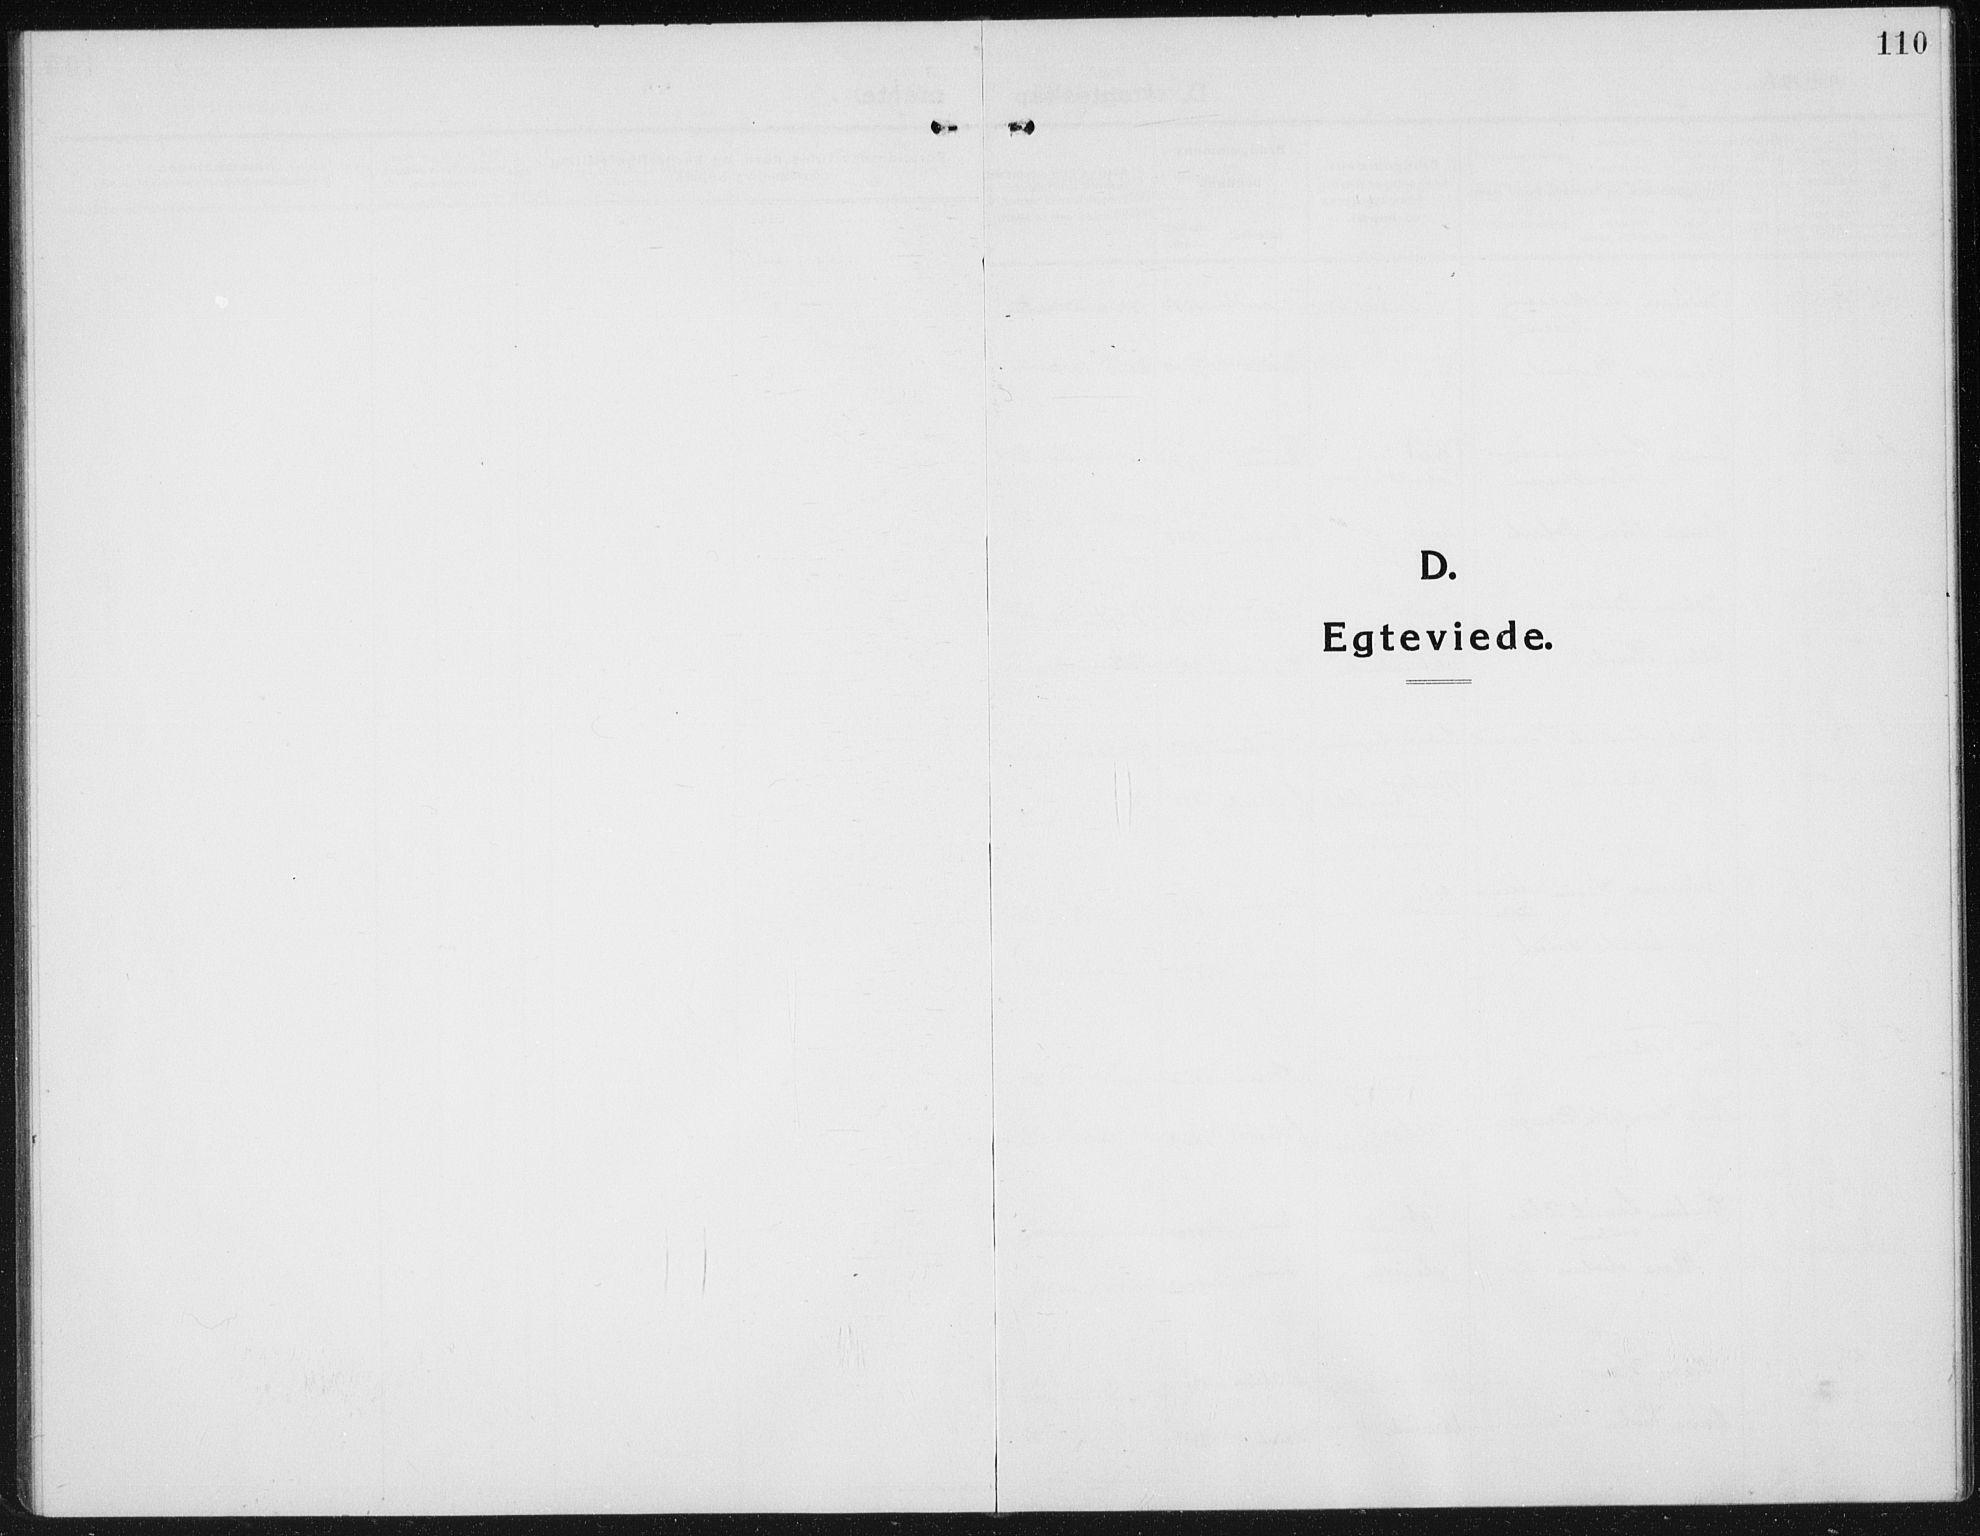 SAH, Kolbu prestekontor, Klokkerbok nr. 6, 1916-1934, s. 110